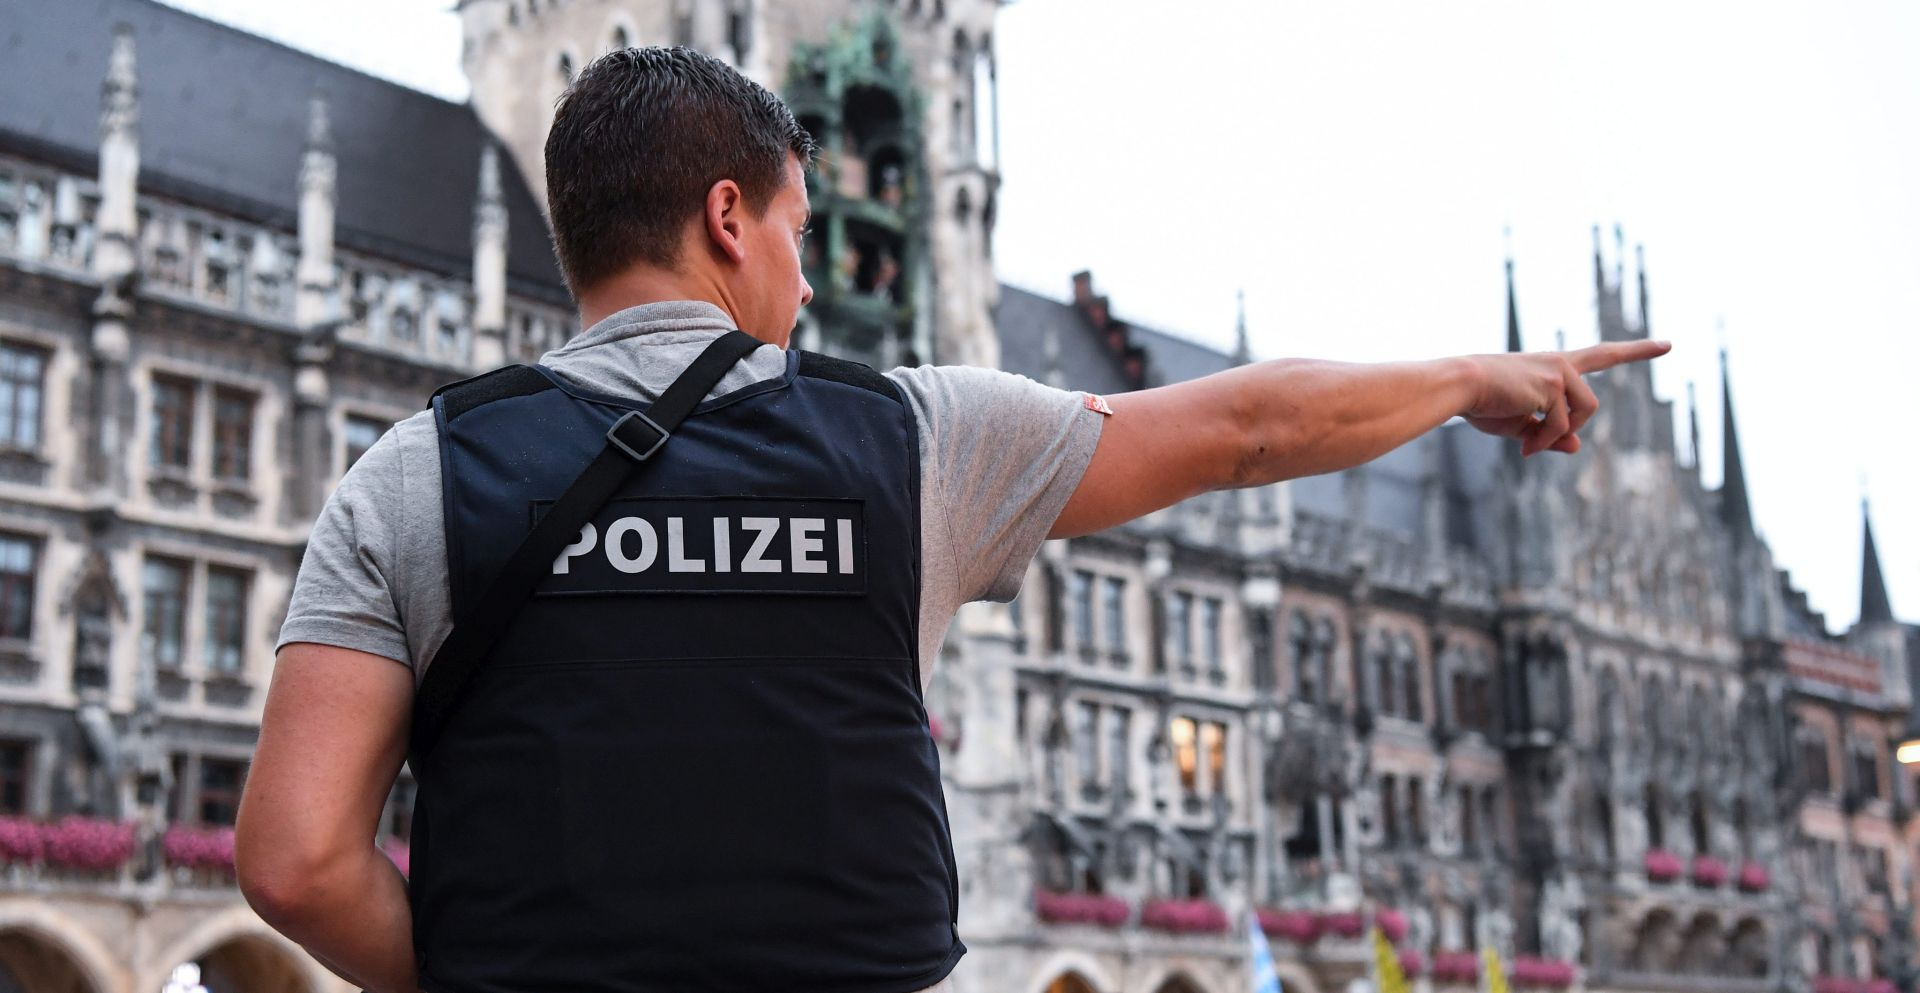 Pristaše IS-a na društvenim mrežama slave napad u Muenchenu